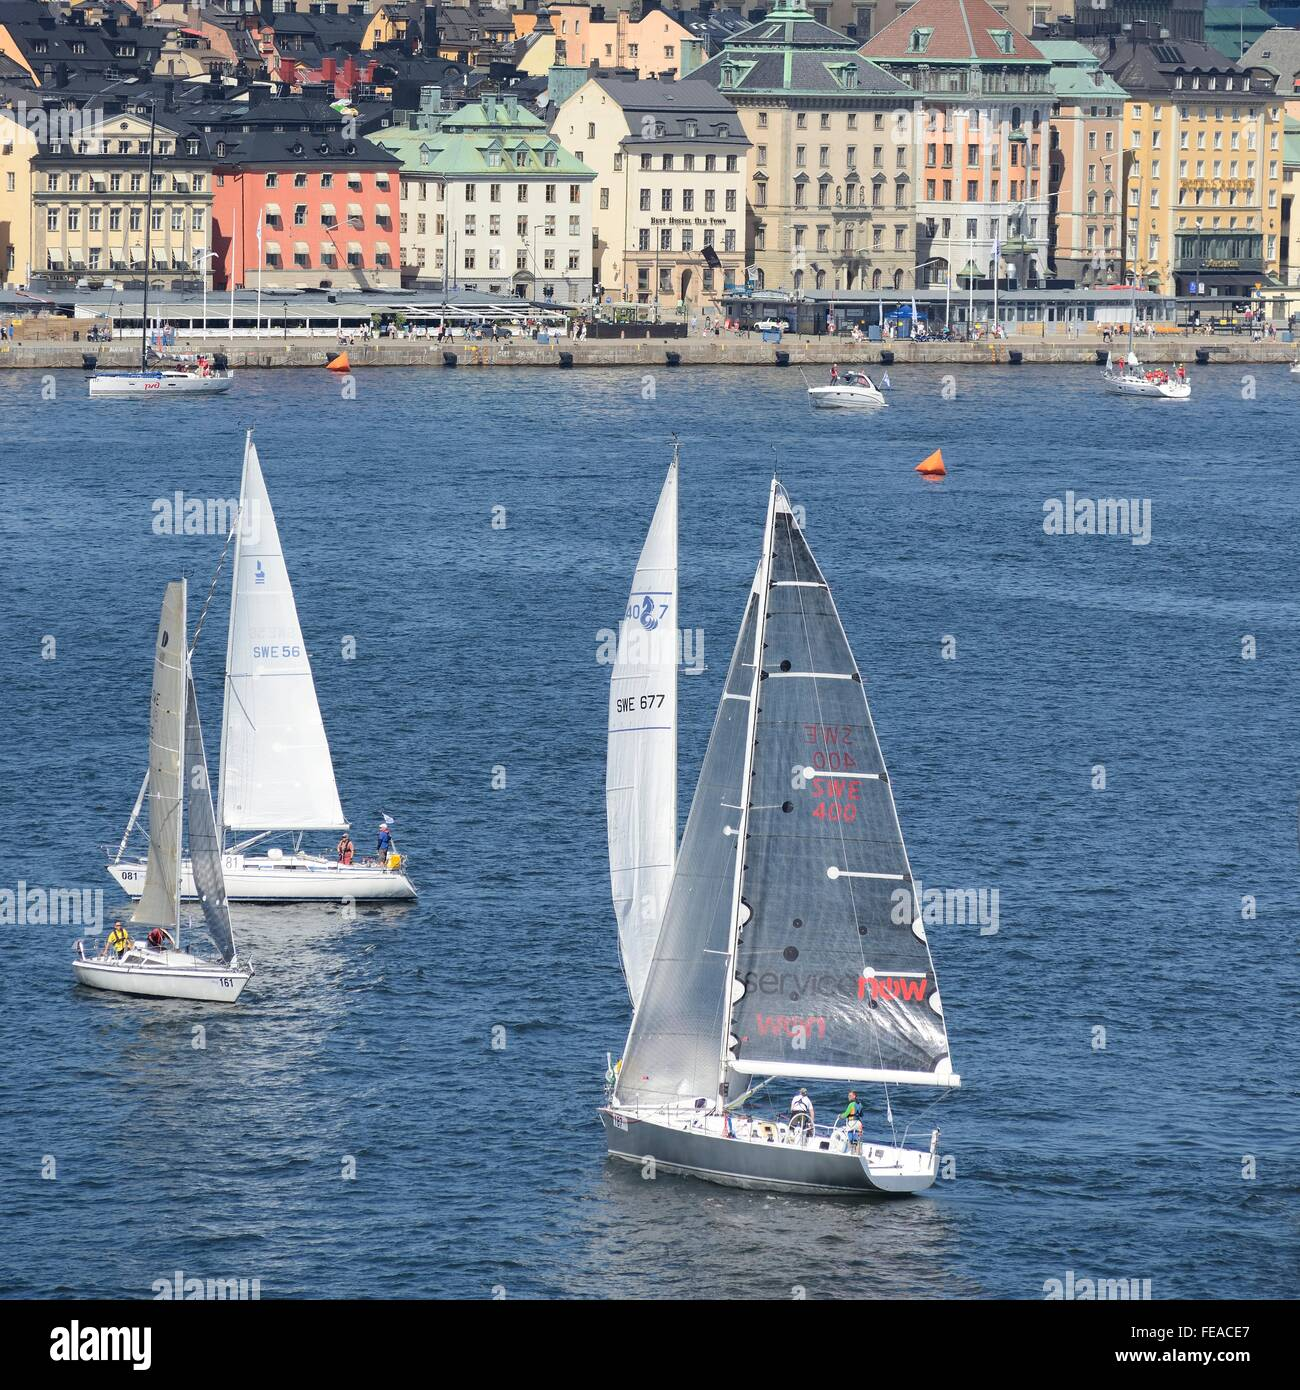 ÅF Offshore Race 2015 Stock Photo